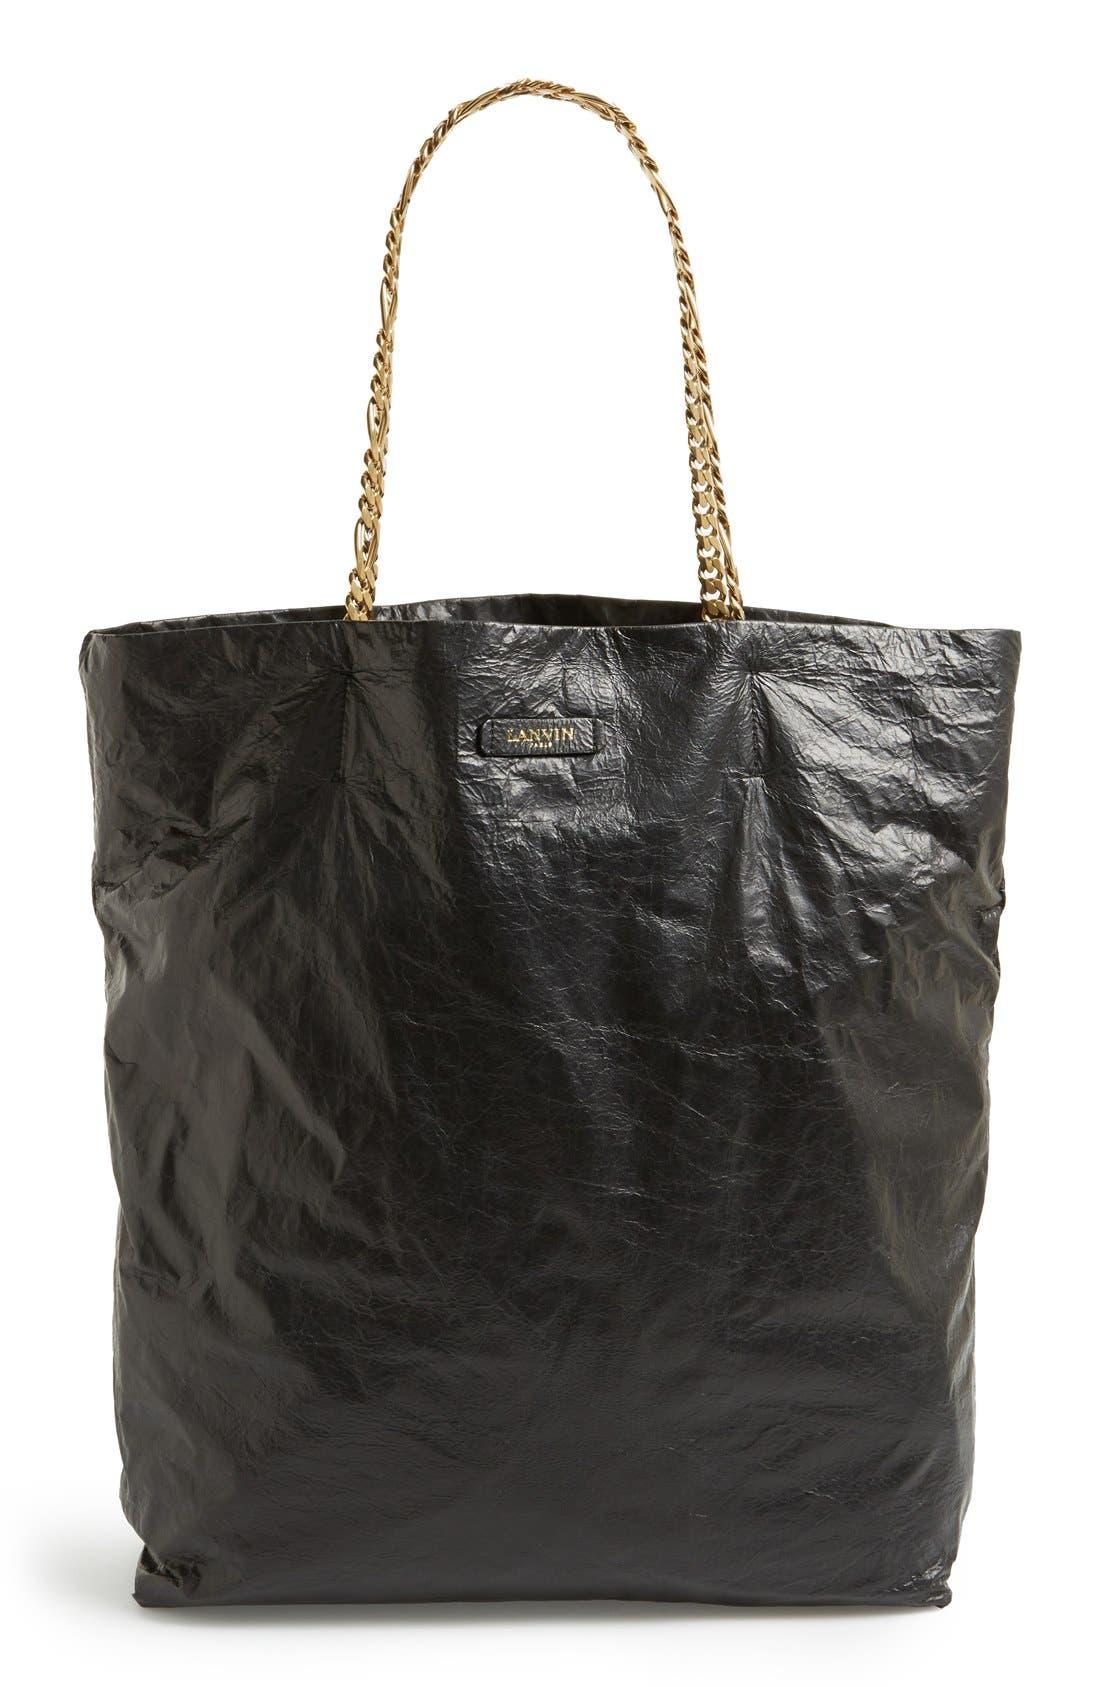 Main Image - Lanvin 'Paper Bag' Laminated Lambskin Tote